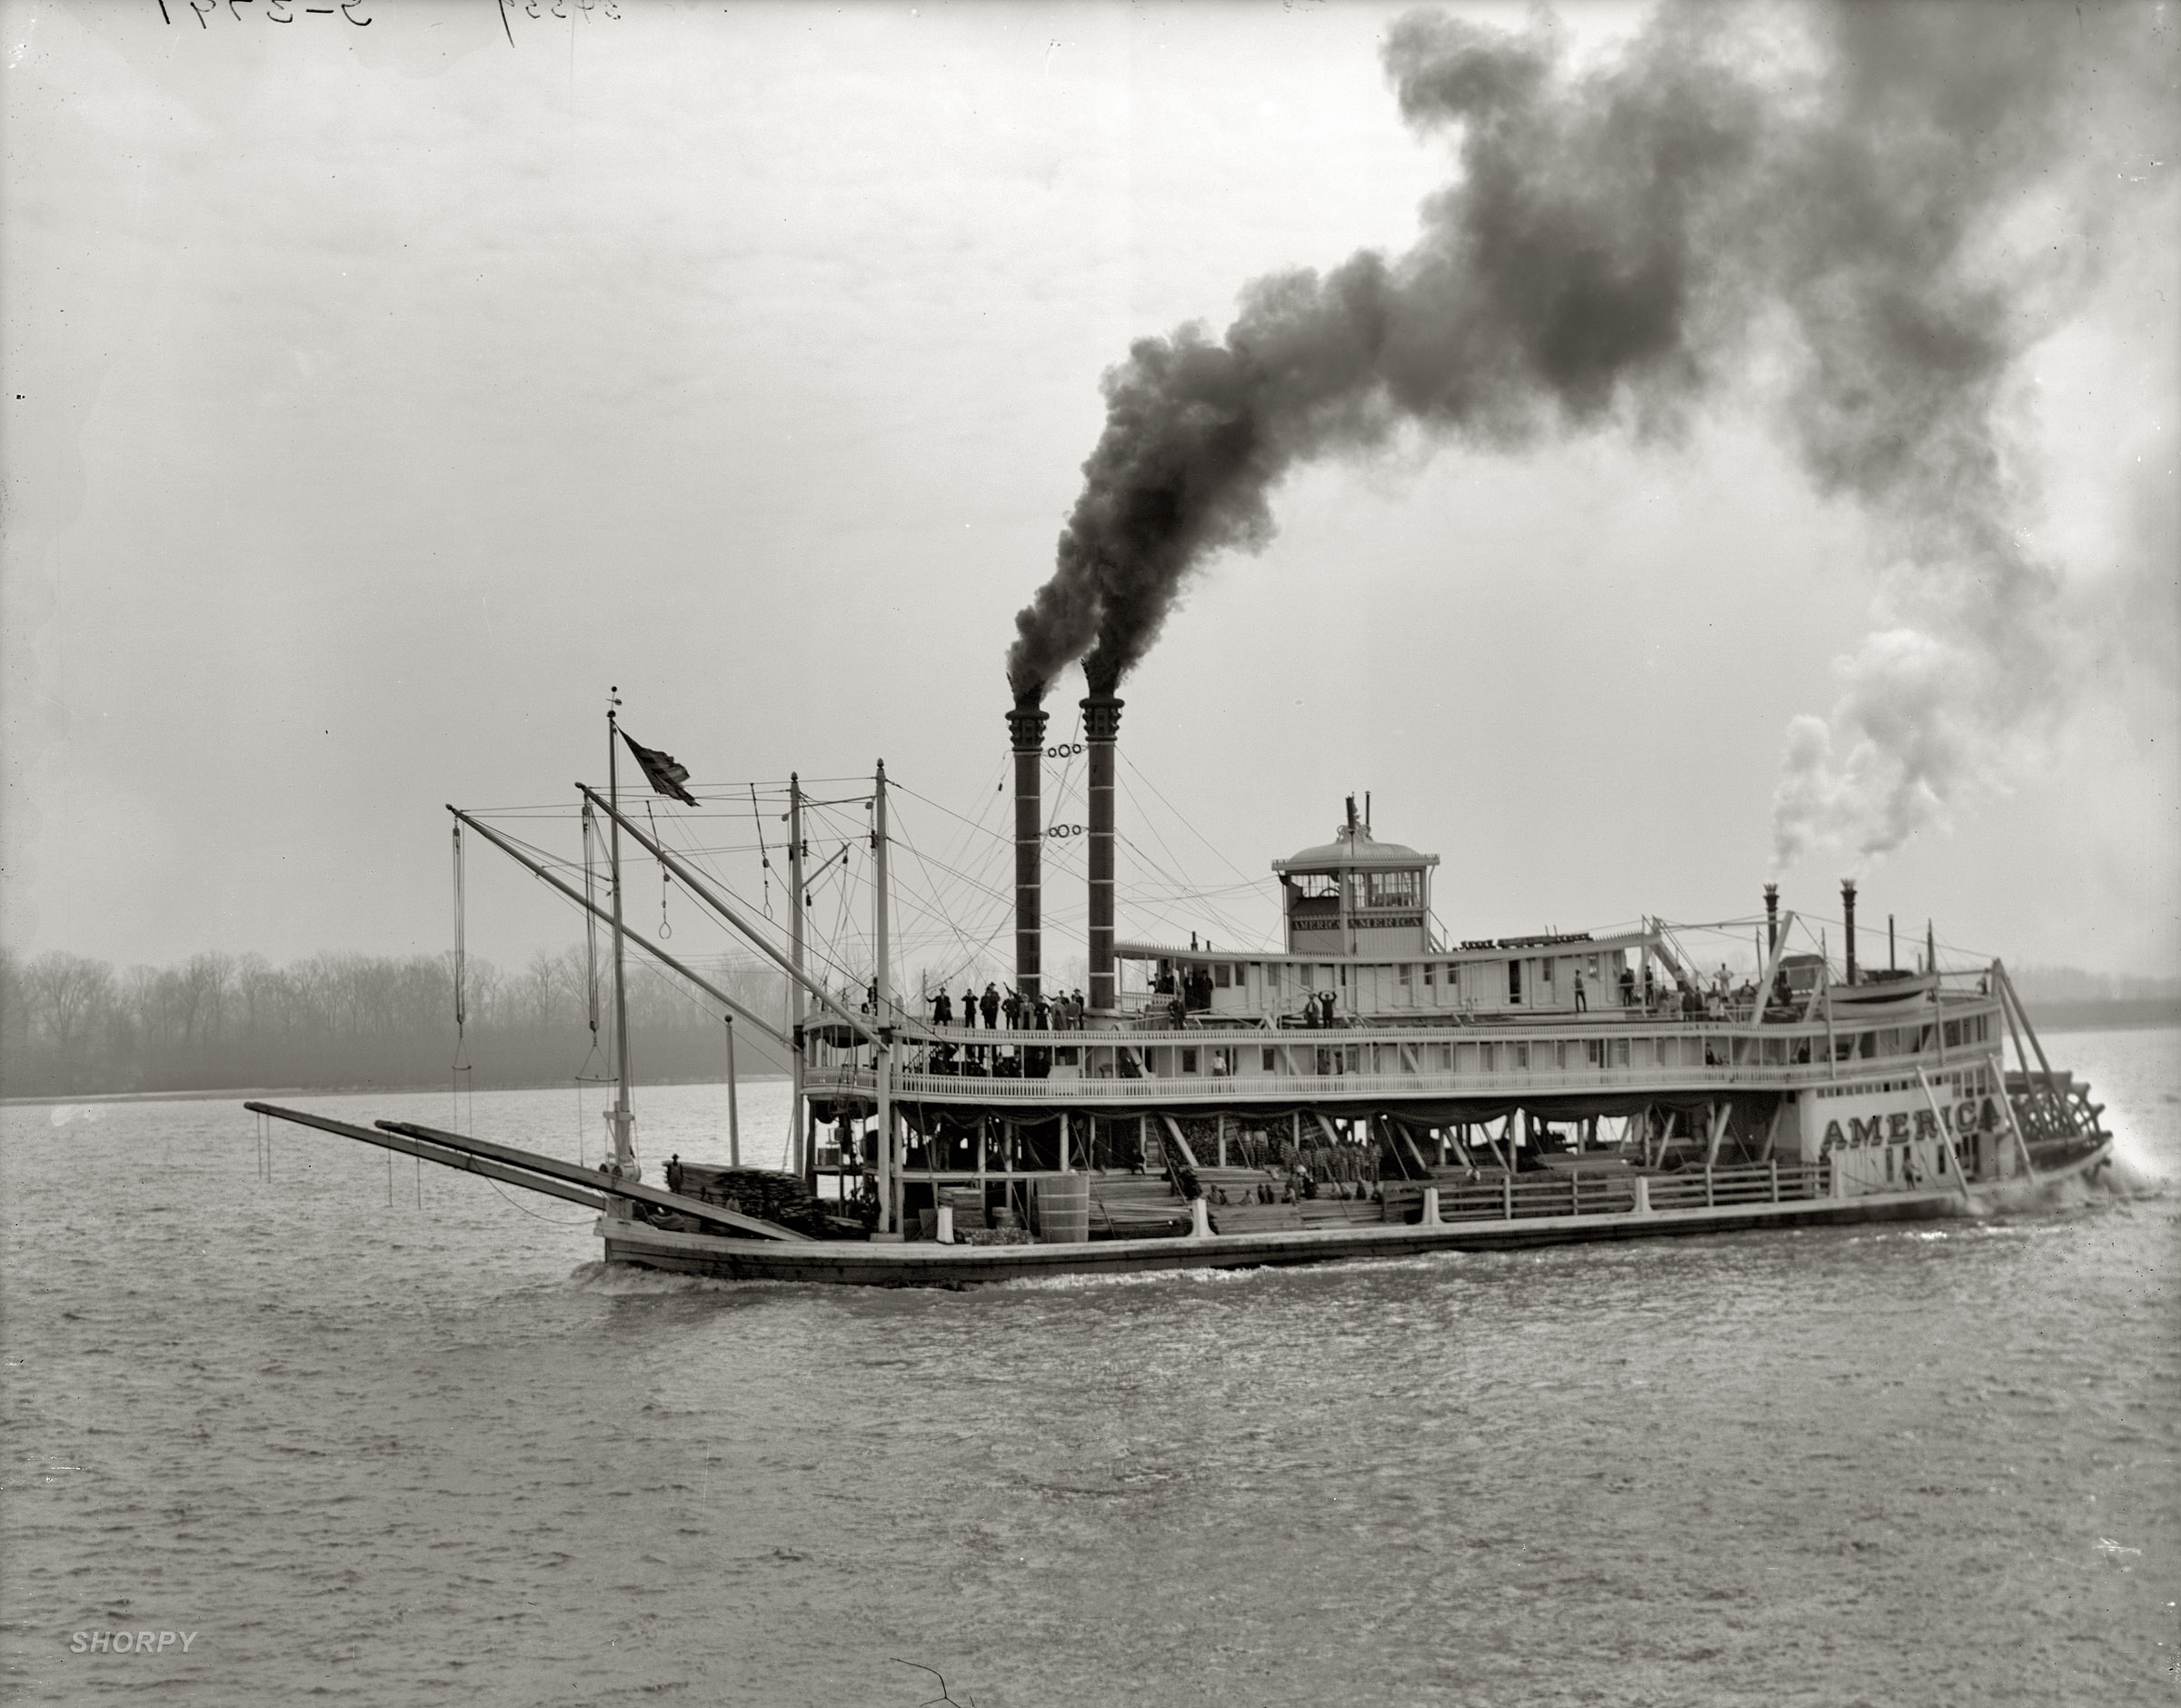 America_1900